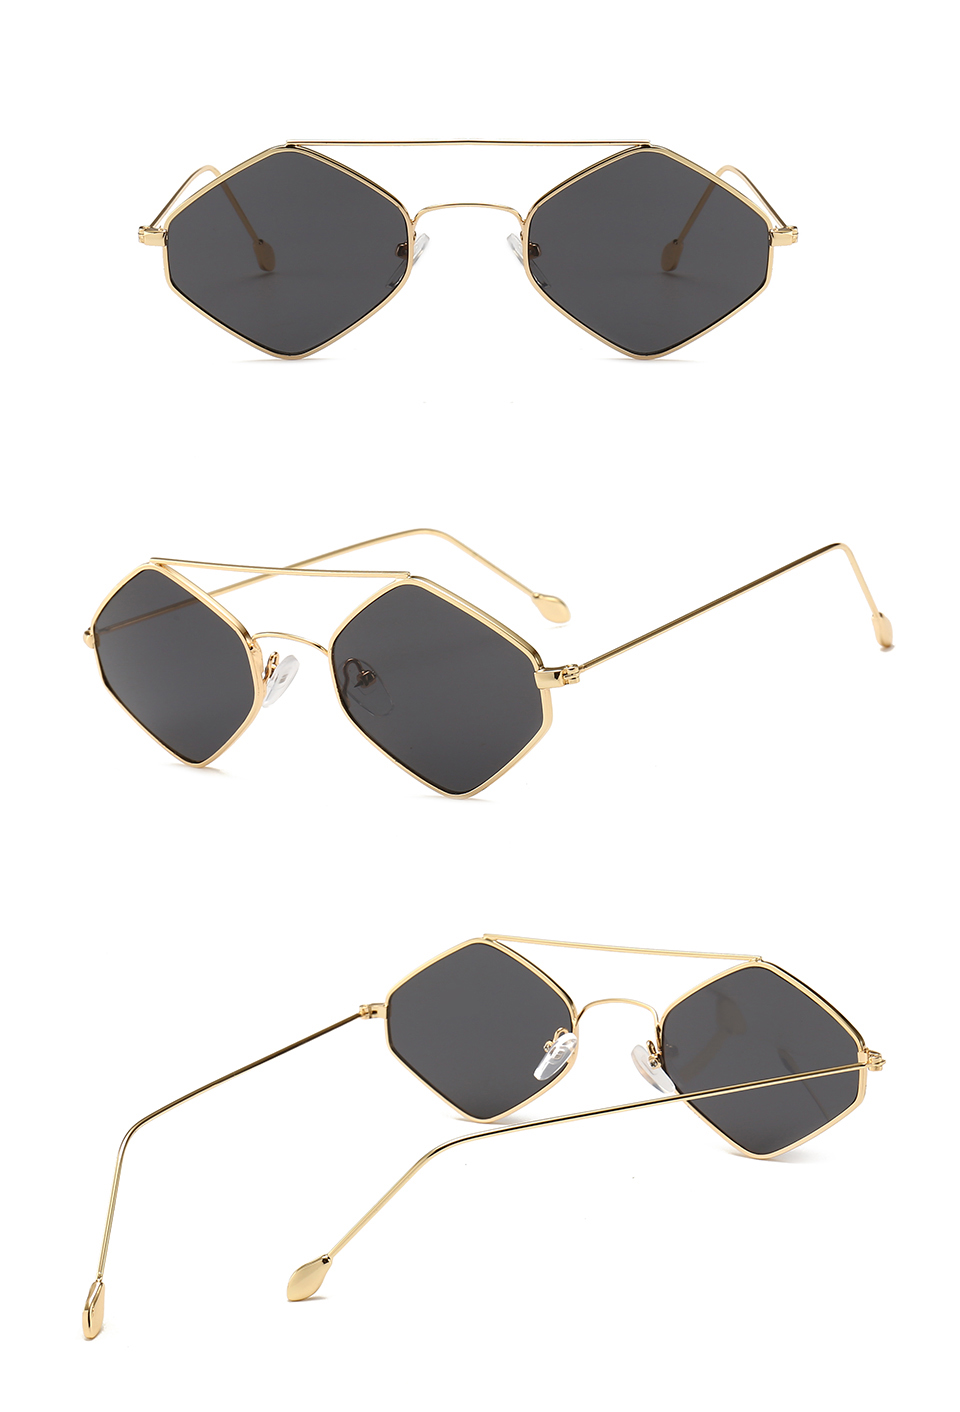 rhombus sunglasses 0459 details (4)